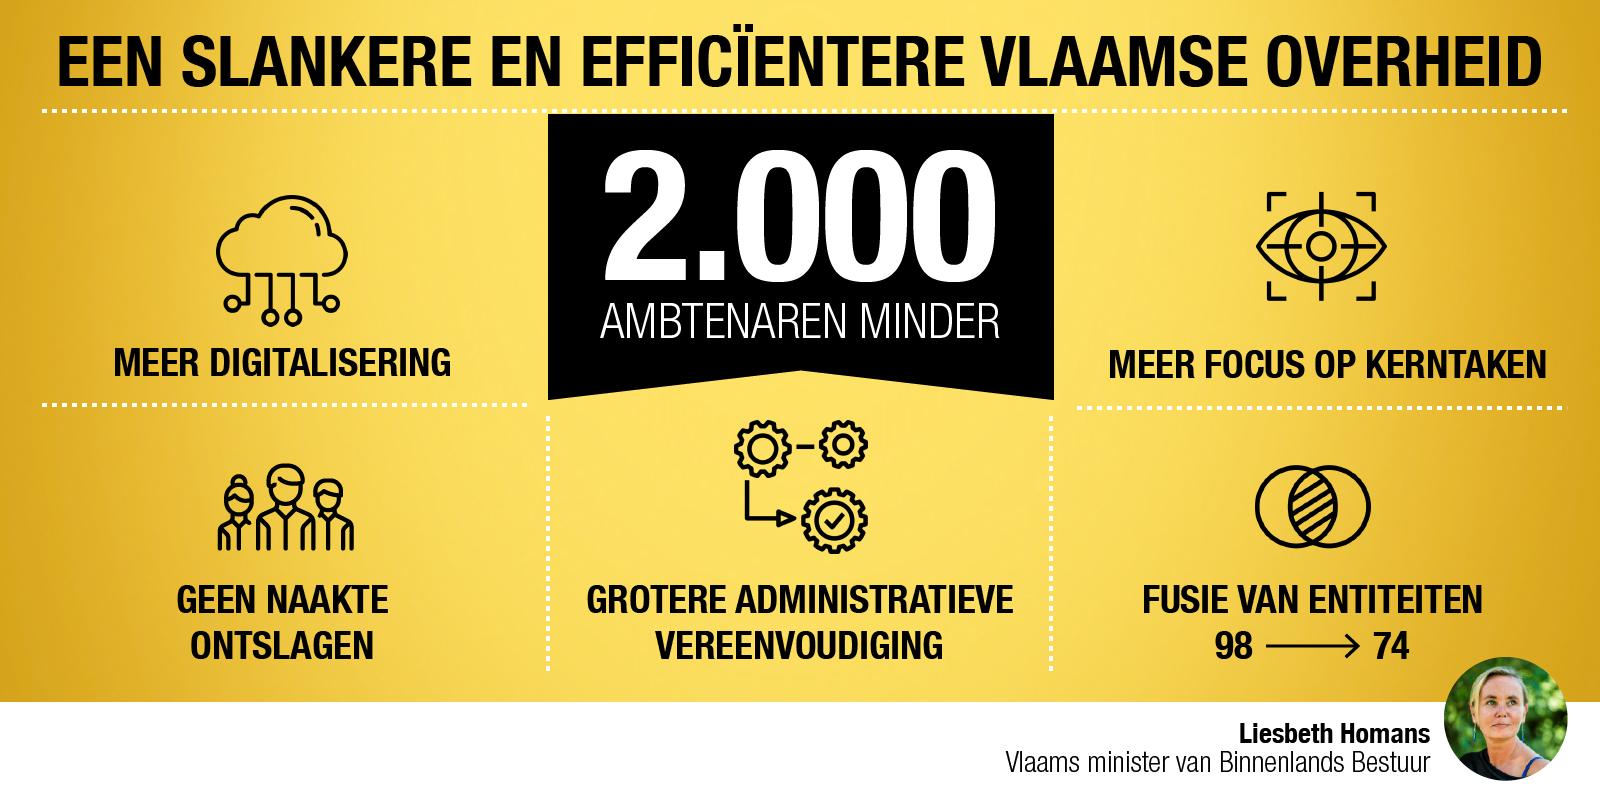 Slanke Vlaamse overheid